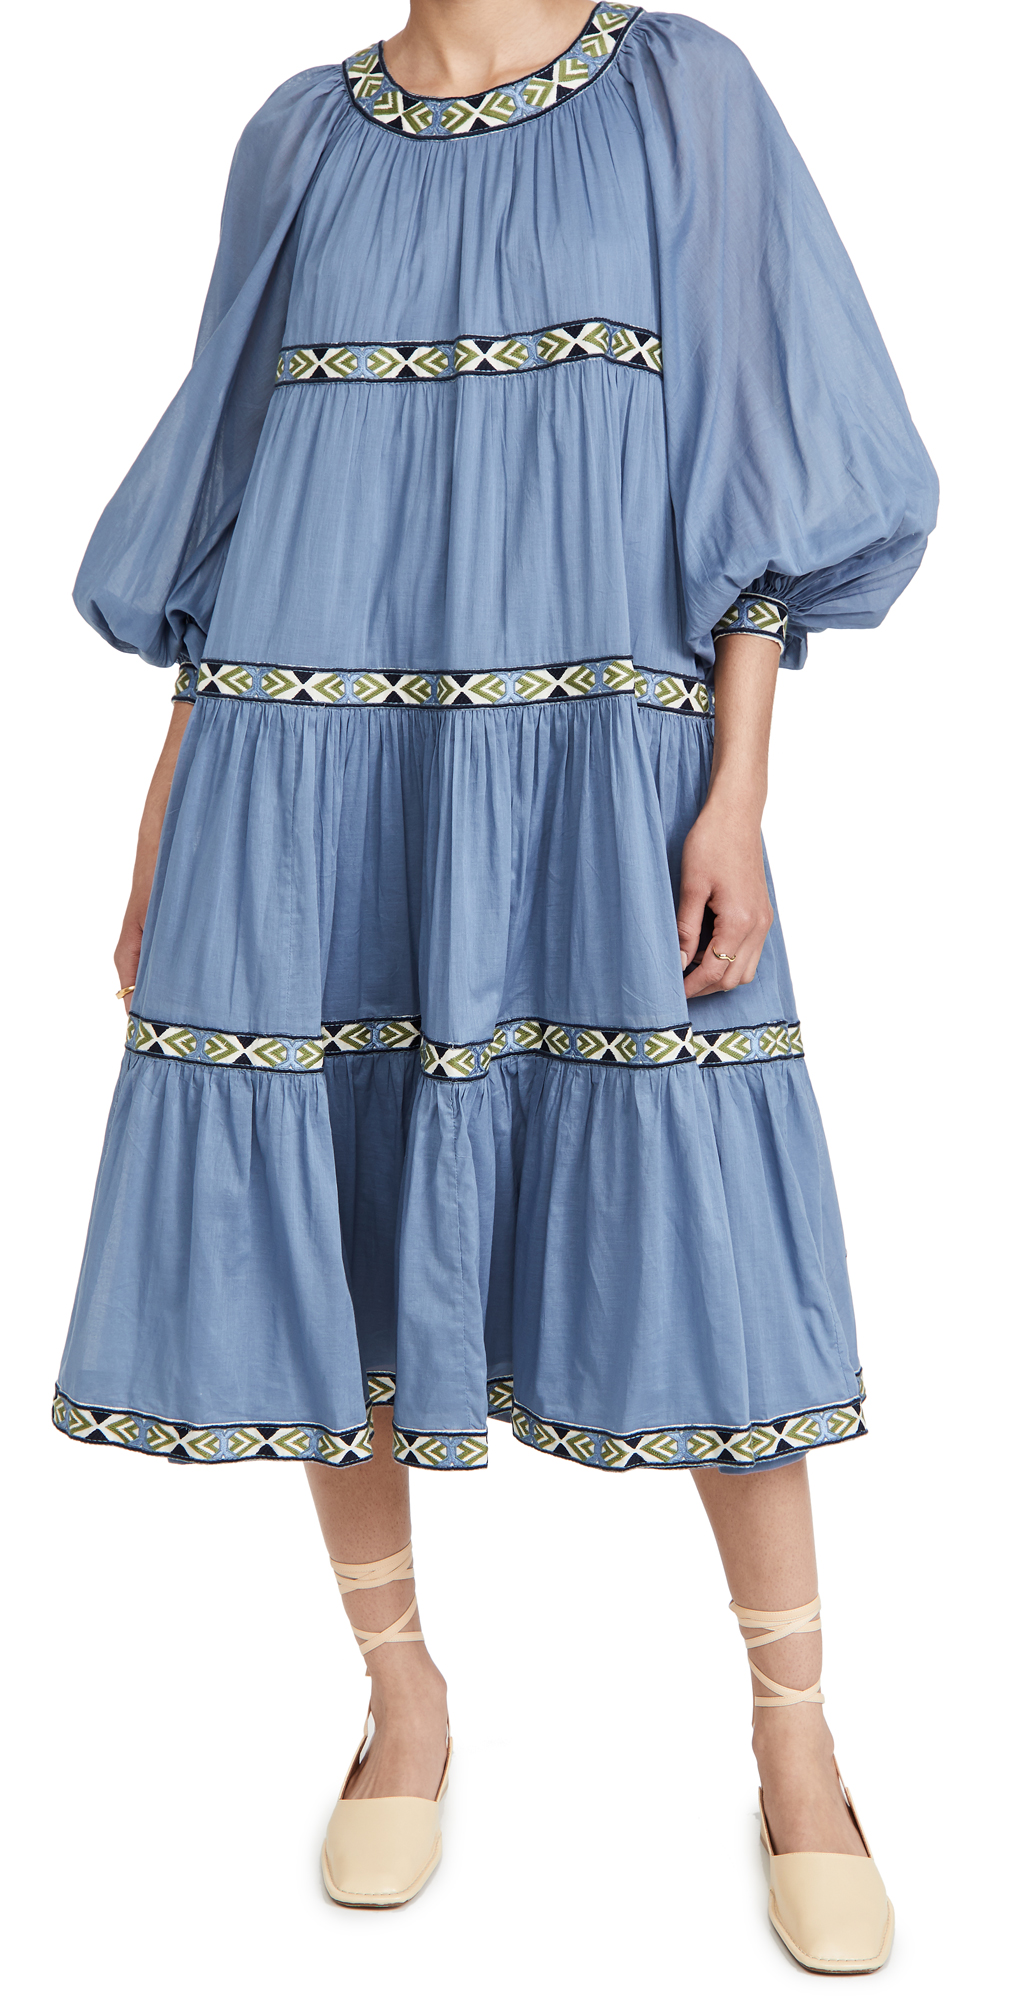 Tory Burch Midi dresses PUFFED SLEEVE DRESS